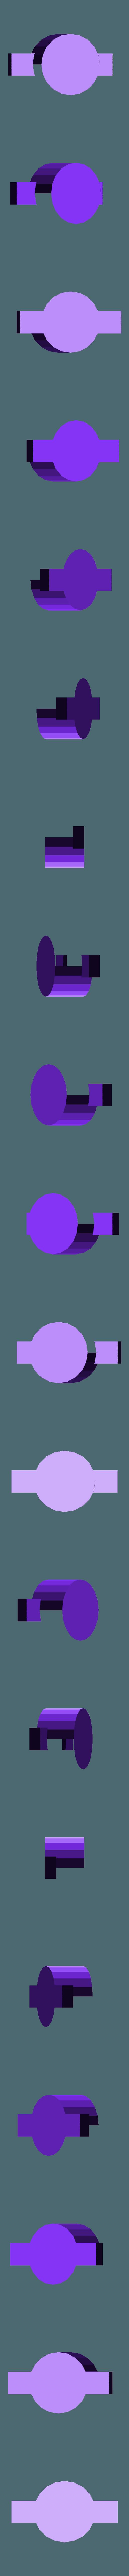 Body_Chimera_Connector.stl Download free STL file Interstellar Army - Quad Mortar and Quad Cannon • 3D printing model, Cikkirock